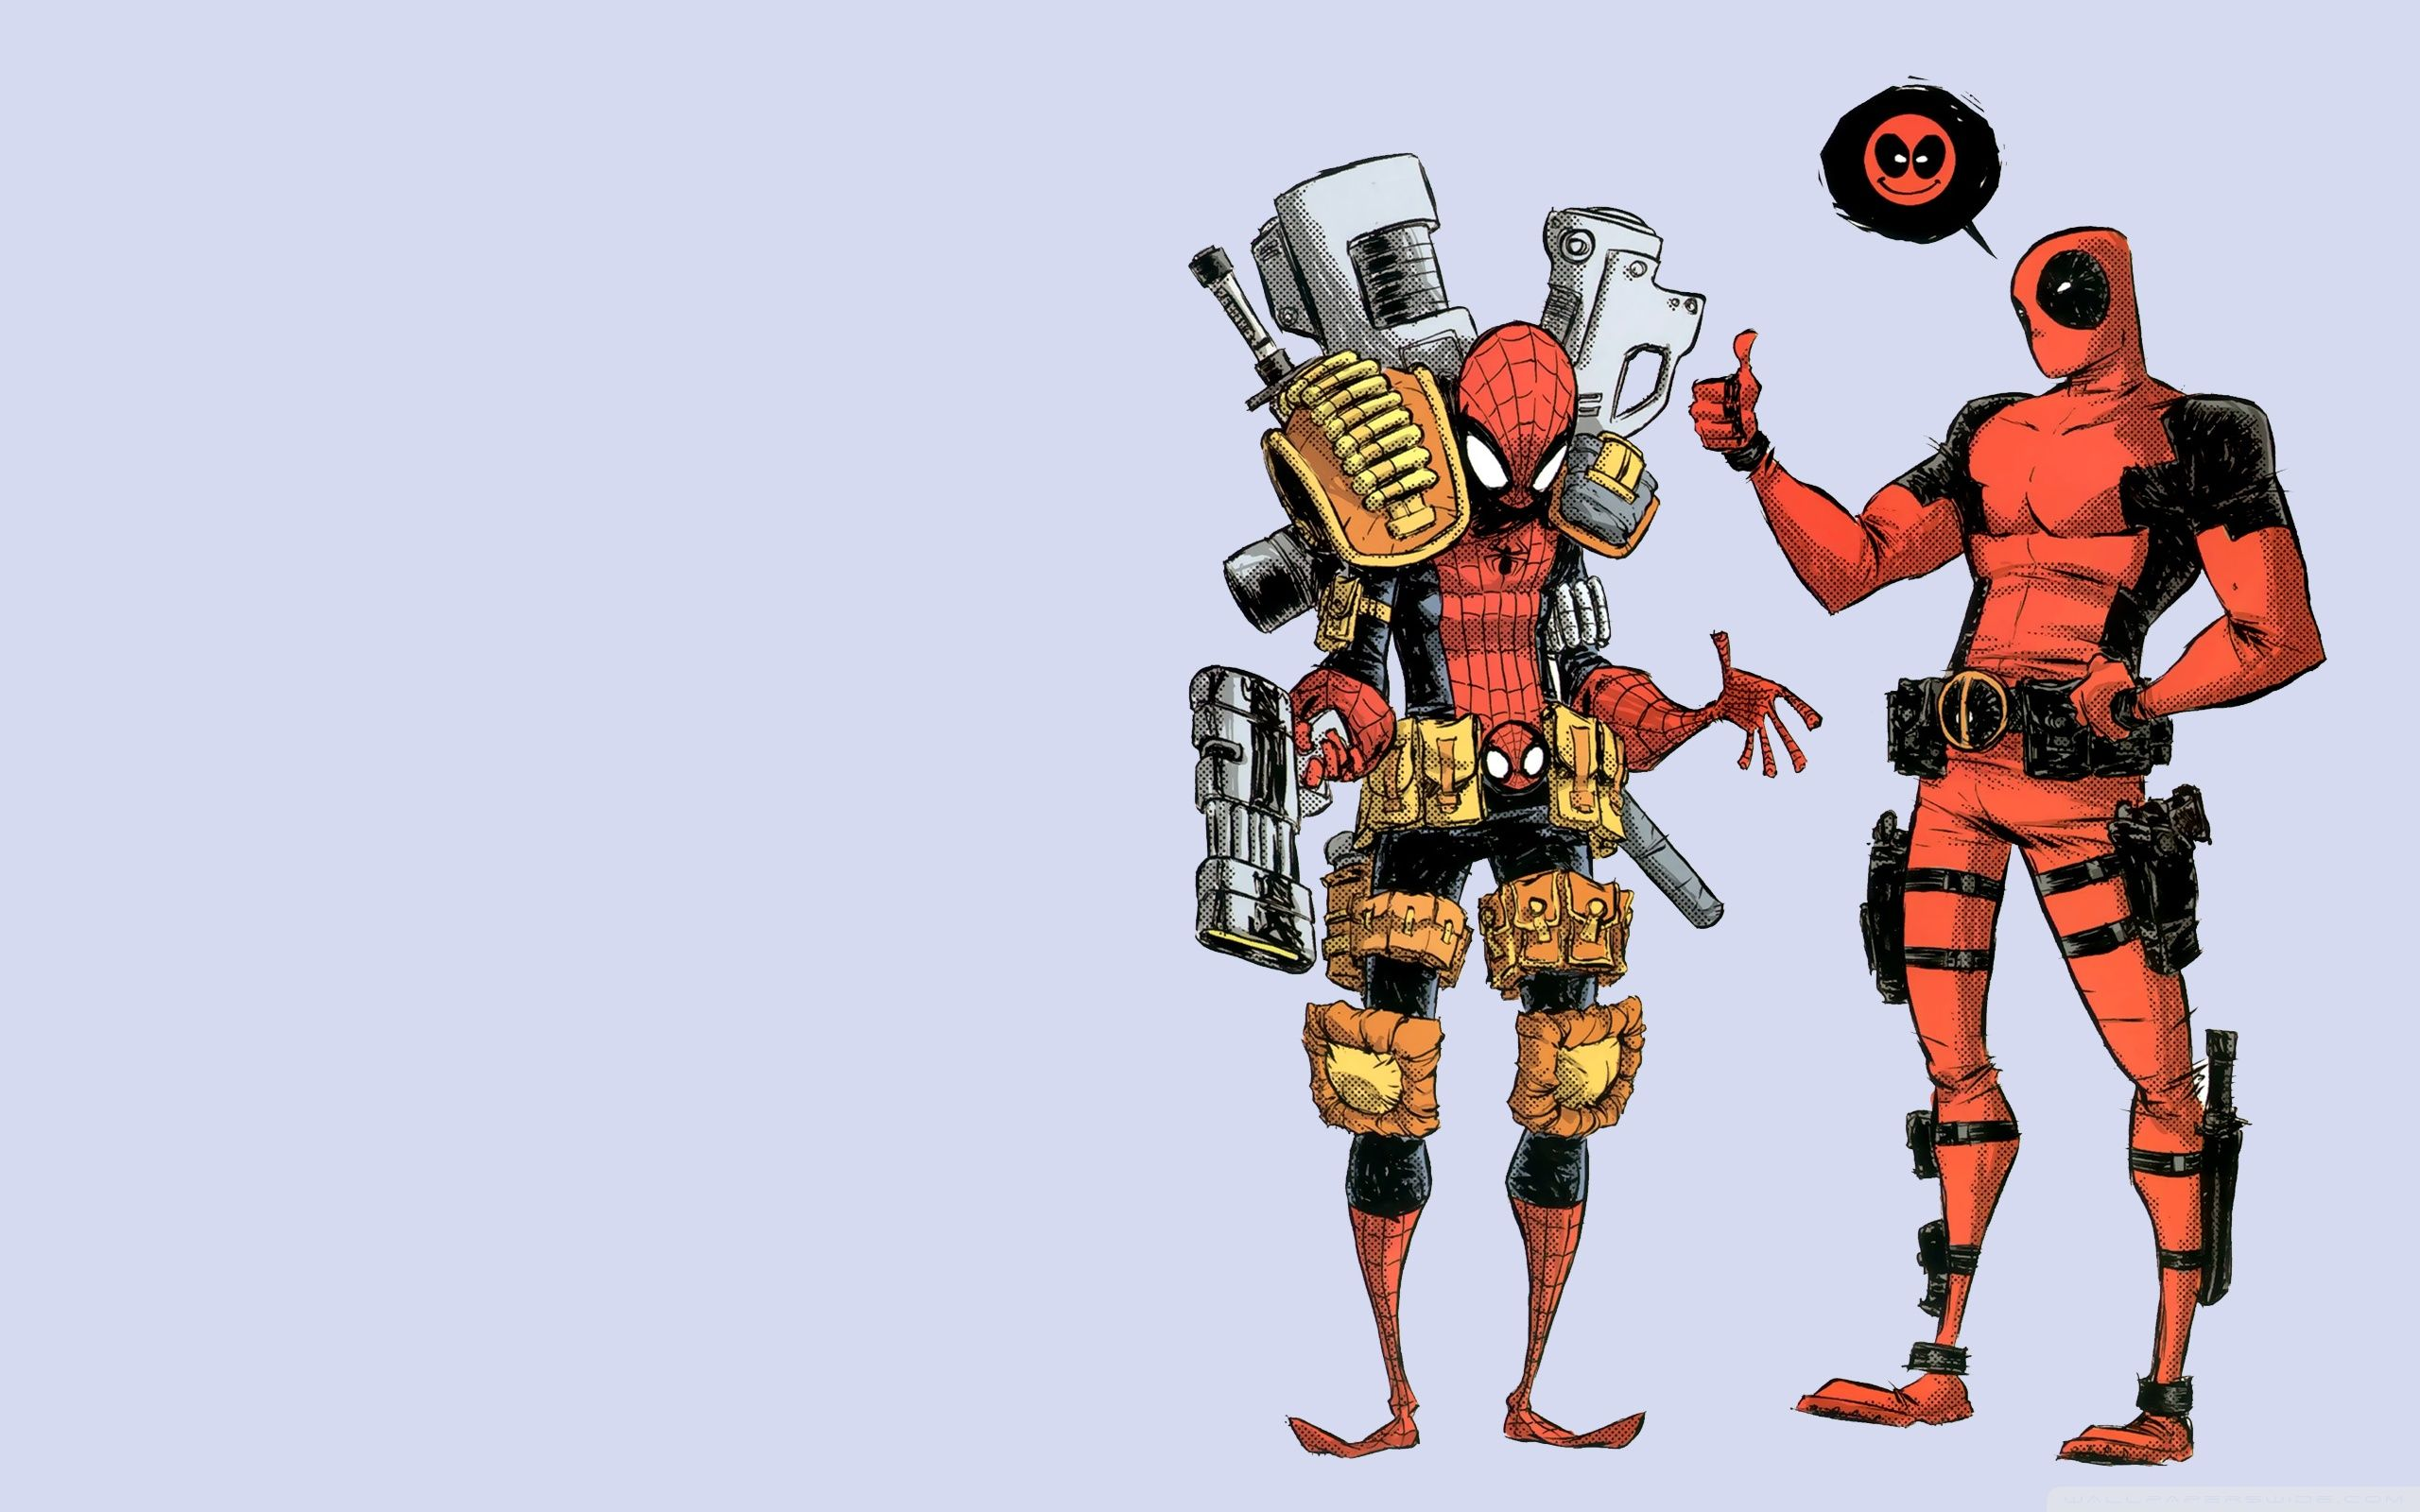 Wallpaper 4K Para Pc Deadpool Images